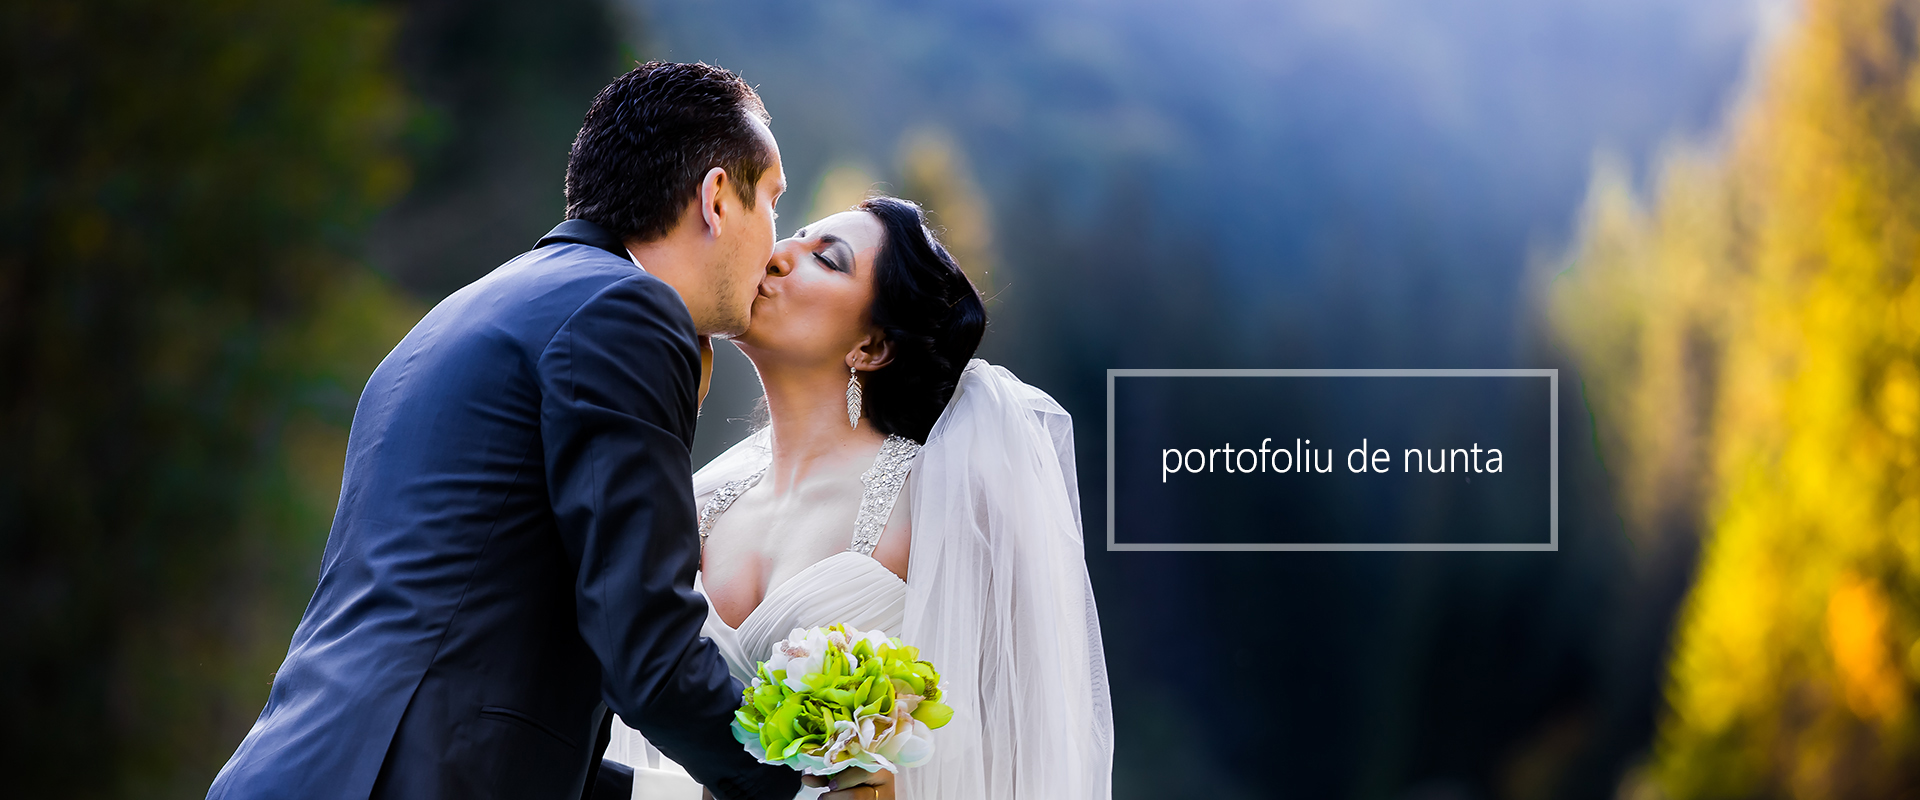 Andreea-si-Gabriel-12-28.06.2014-fotograf-nunta-Cristi-Timofte 2